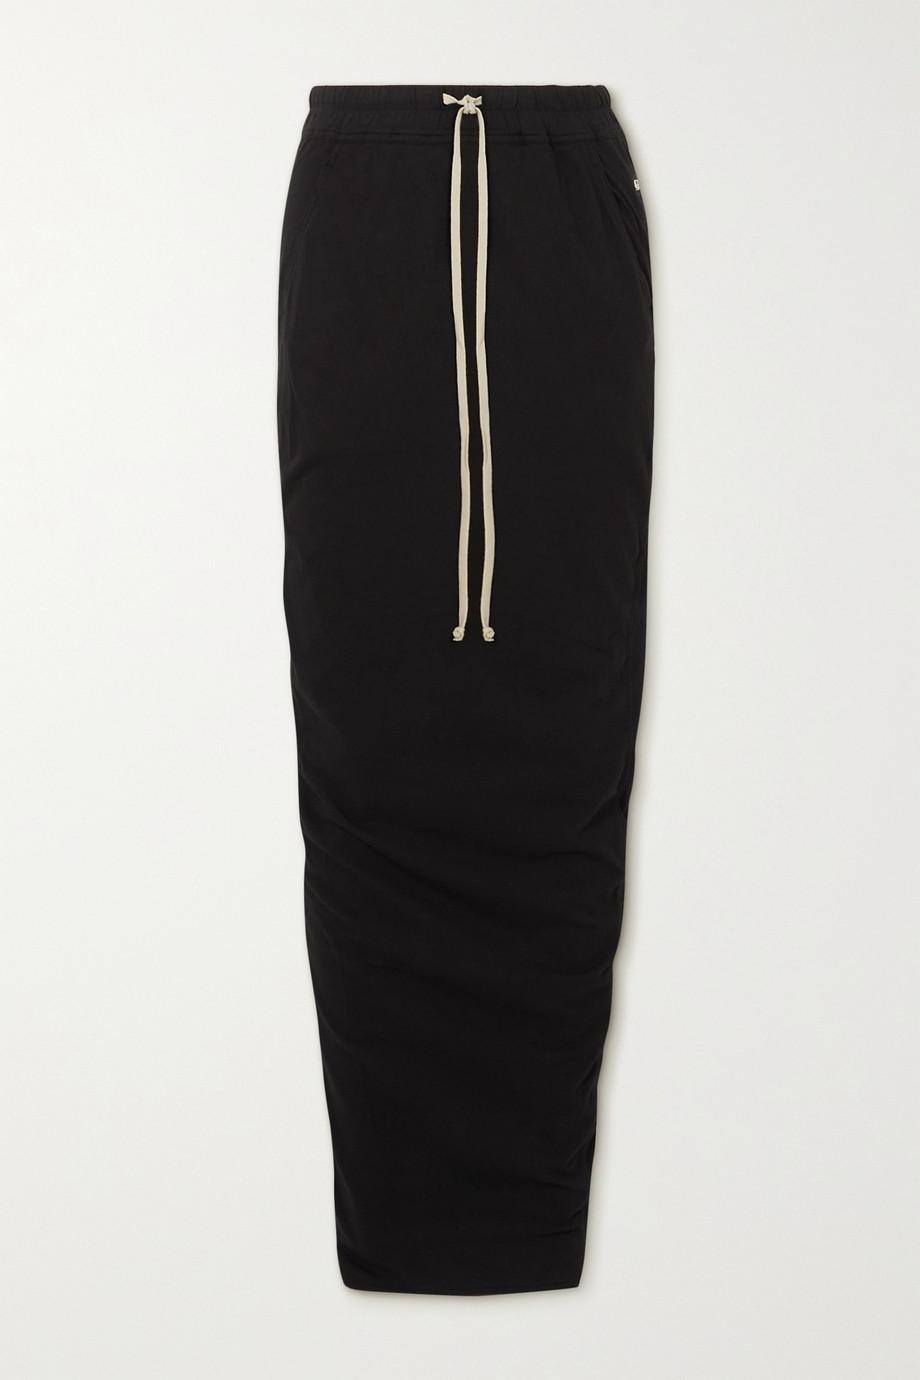 Rick Owens Gonna appliquéd cotton-jersey maxi skirt